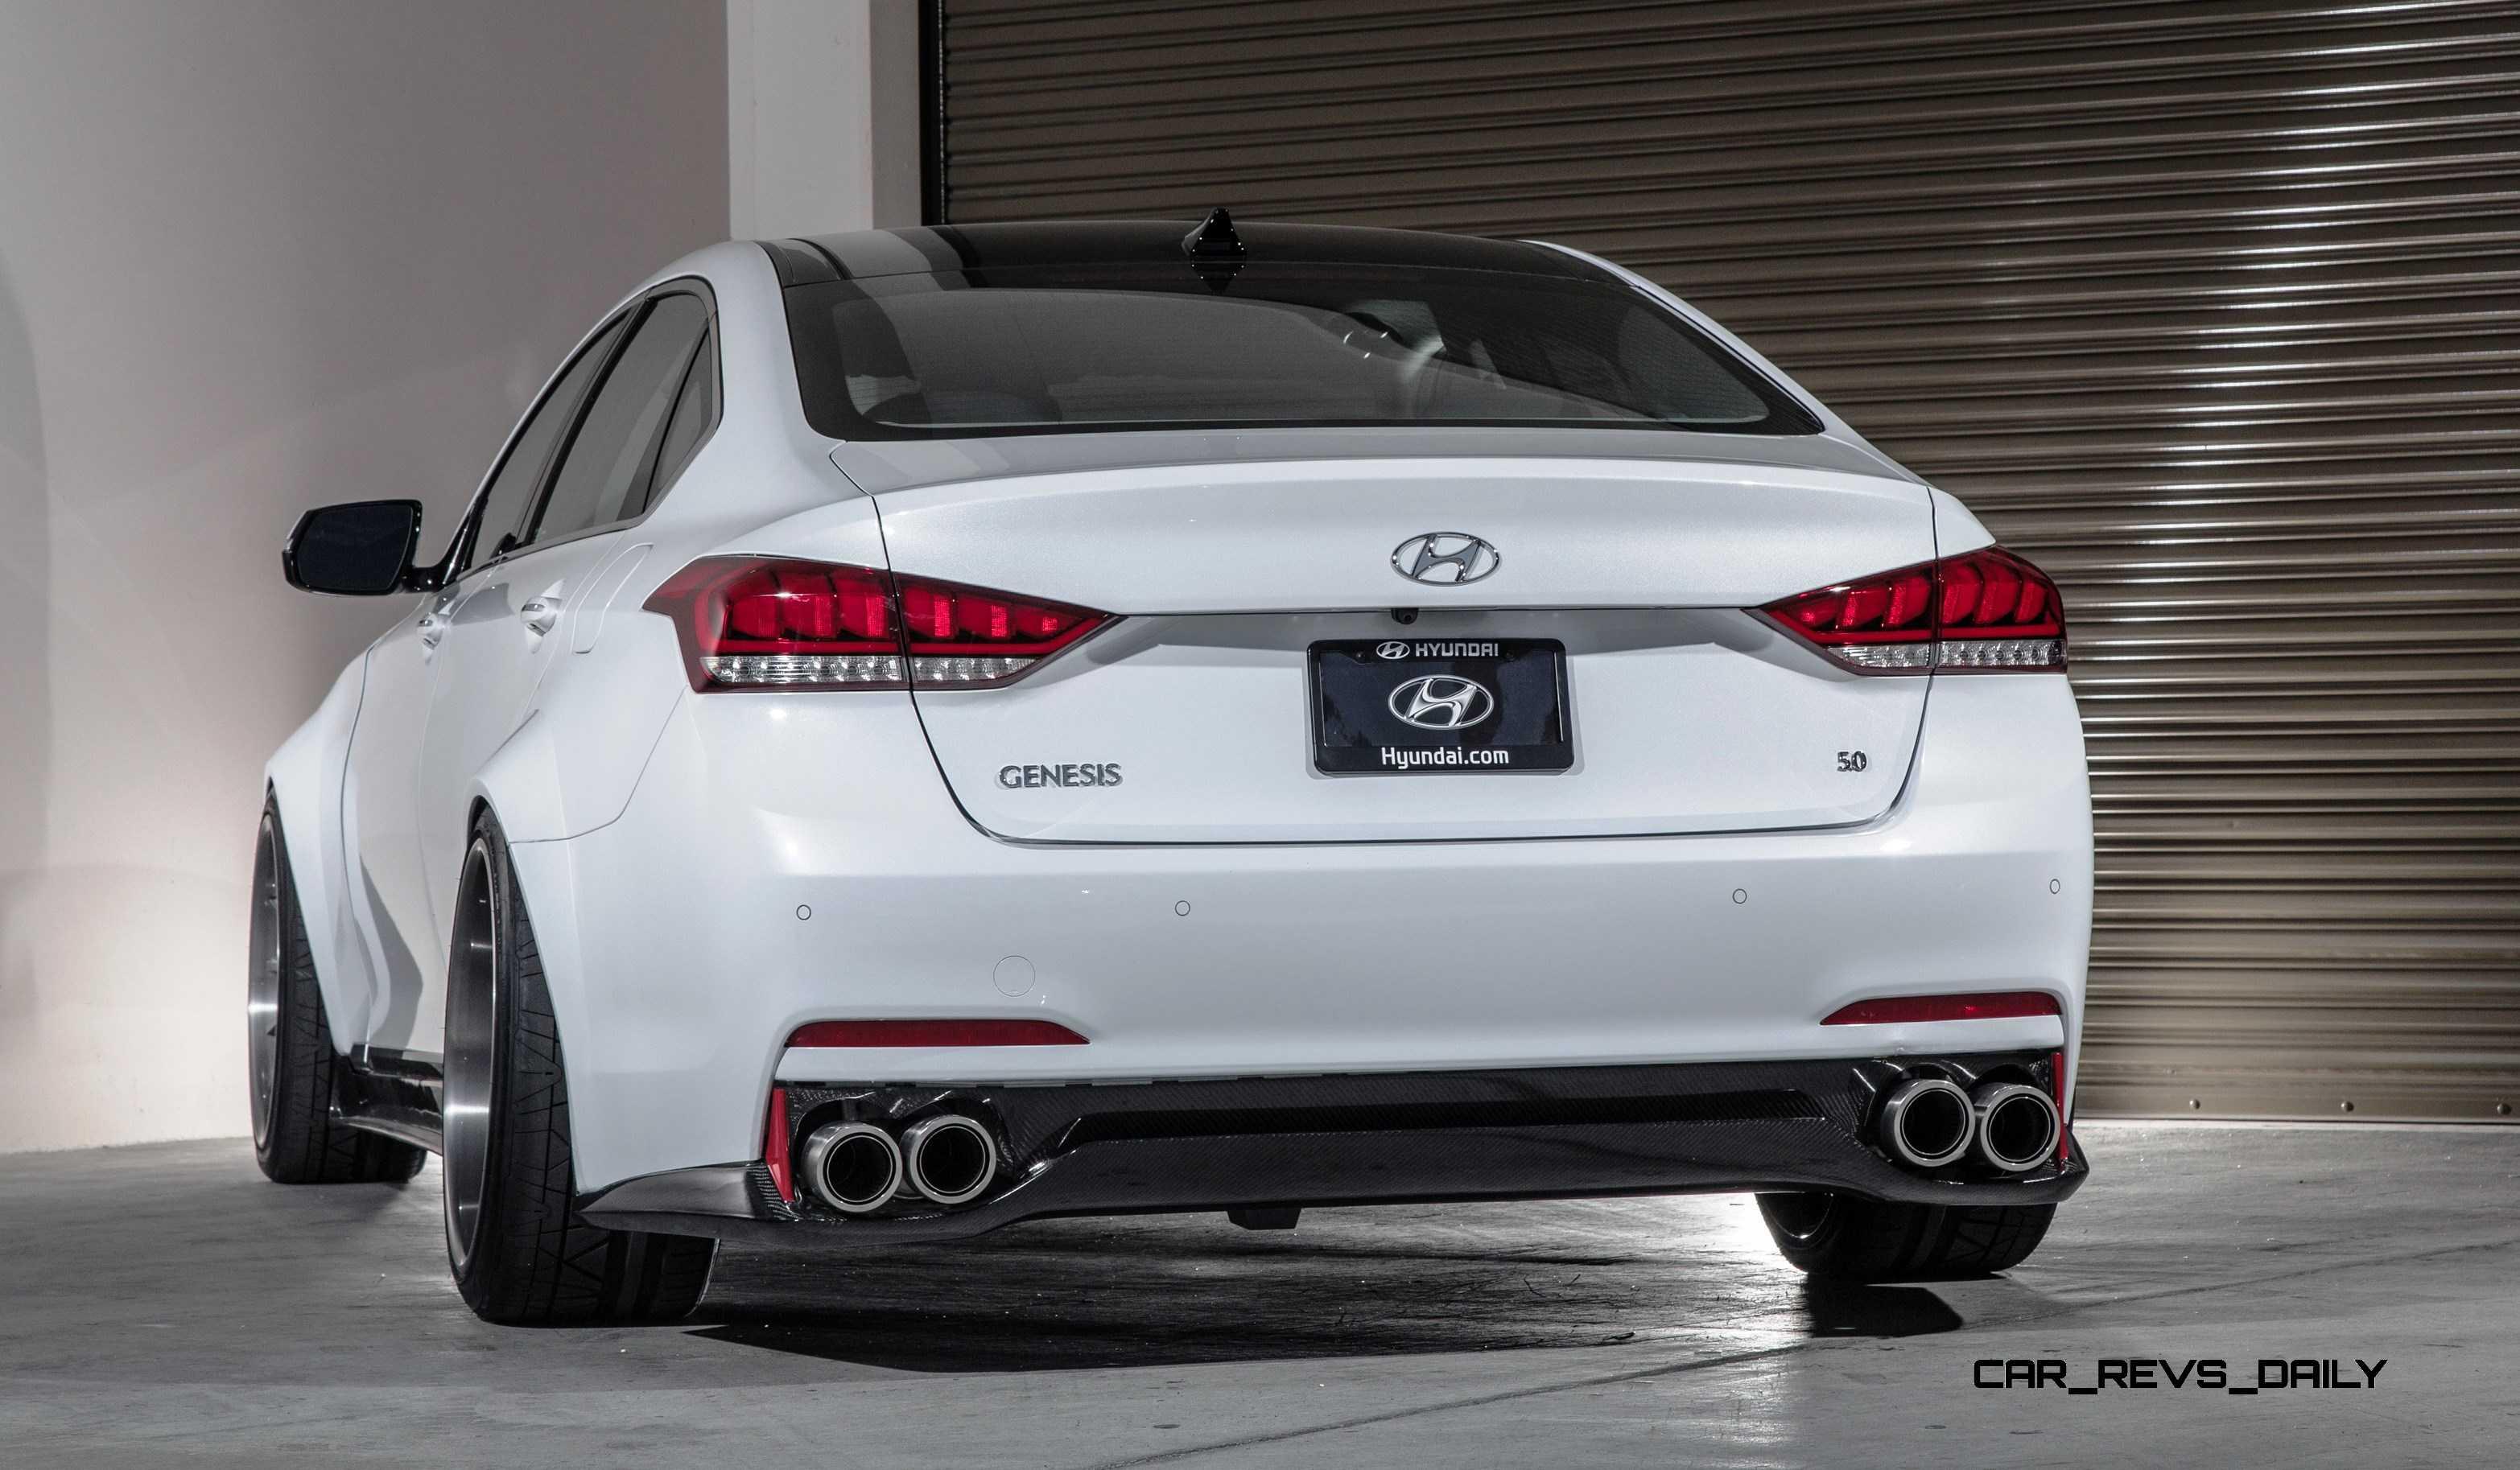 Dh Auto Sales >> 2015 Hyundai Genesis AR550 ARK Performance